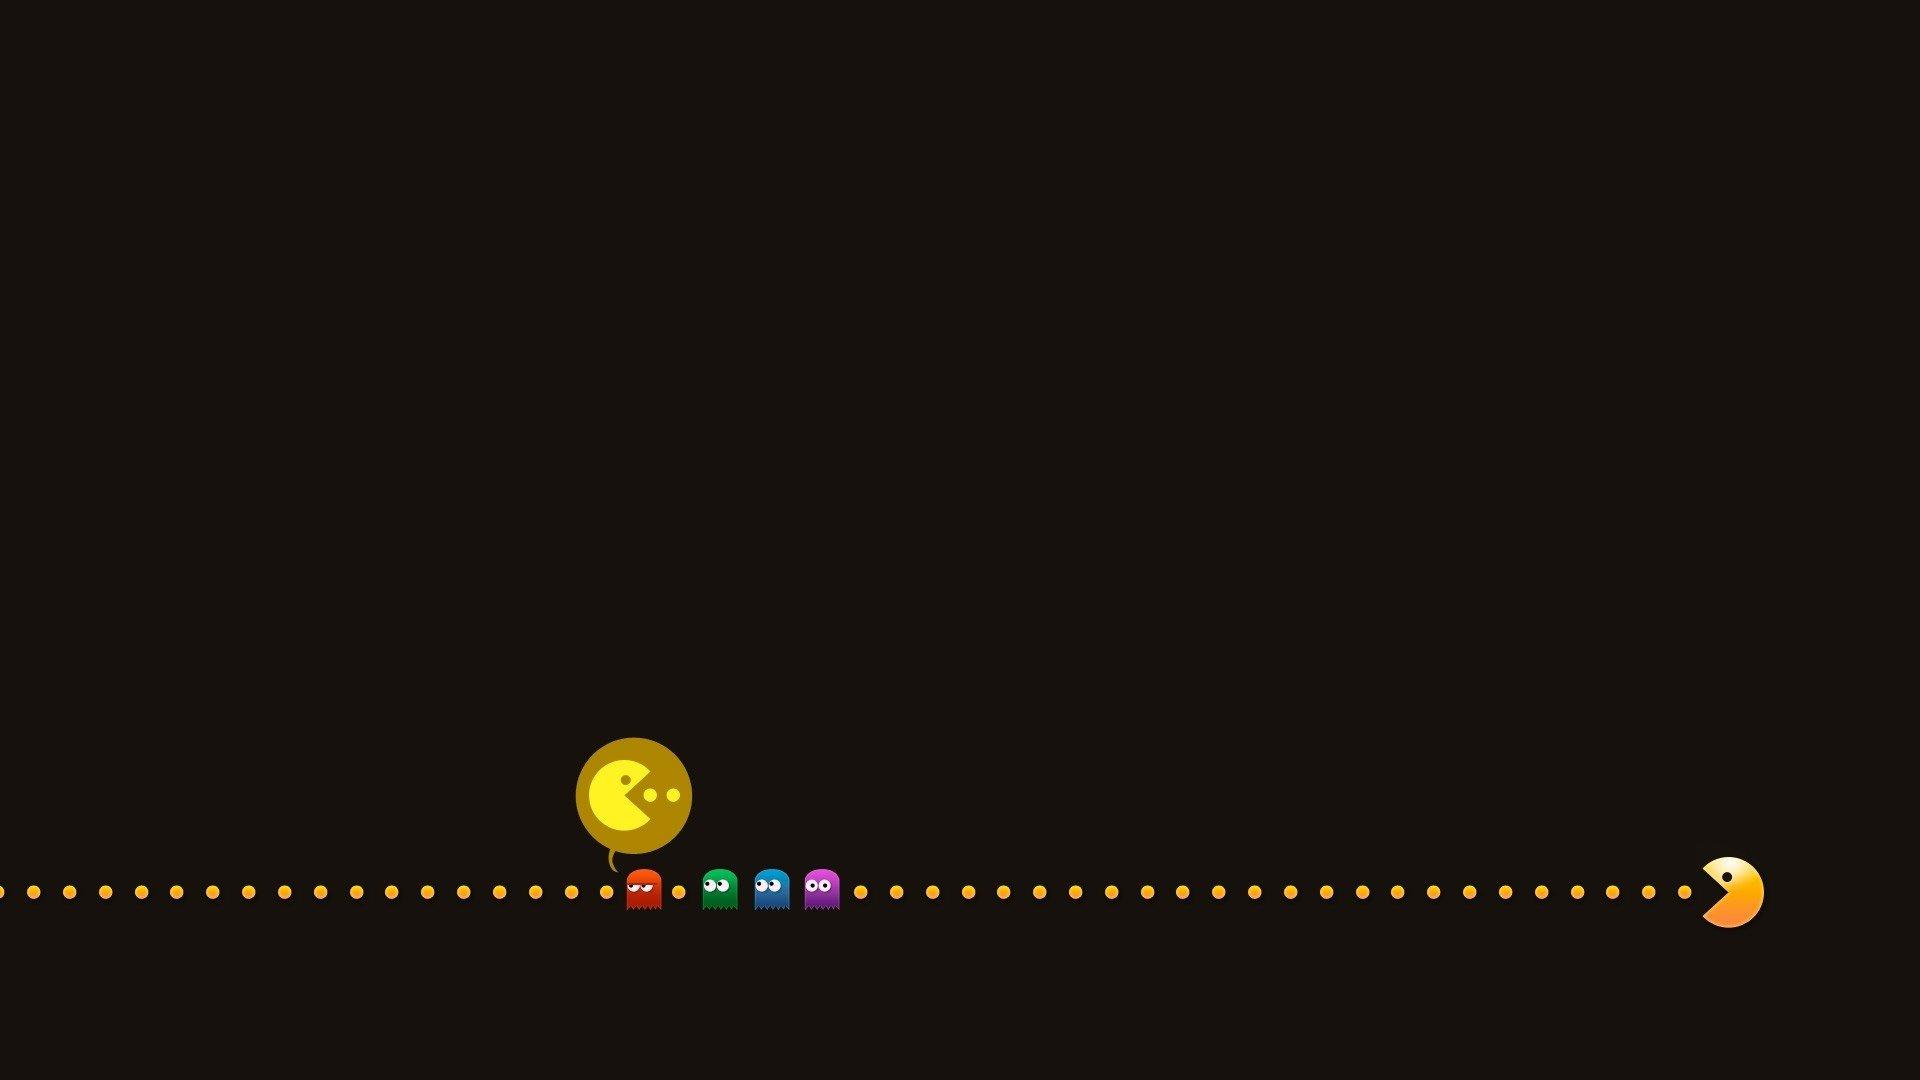 Pubg Wallpaper 3 Monitors Pac Man Full Hd Wallpaper And Background Image 1920x1080